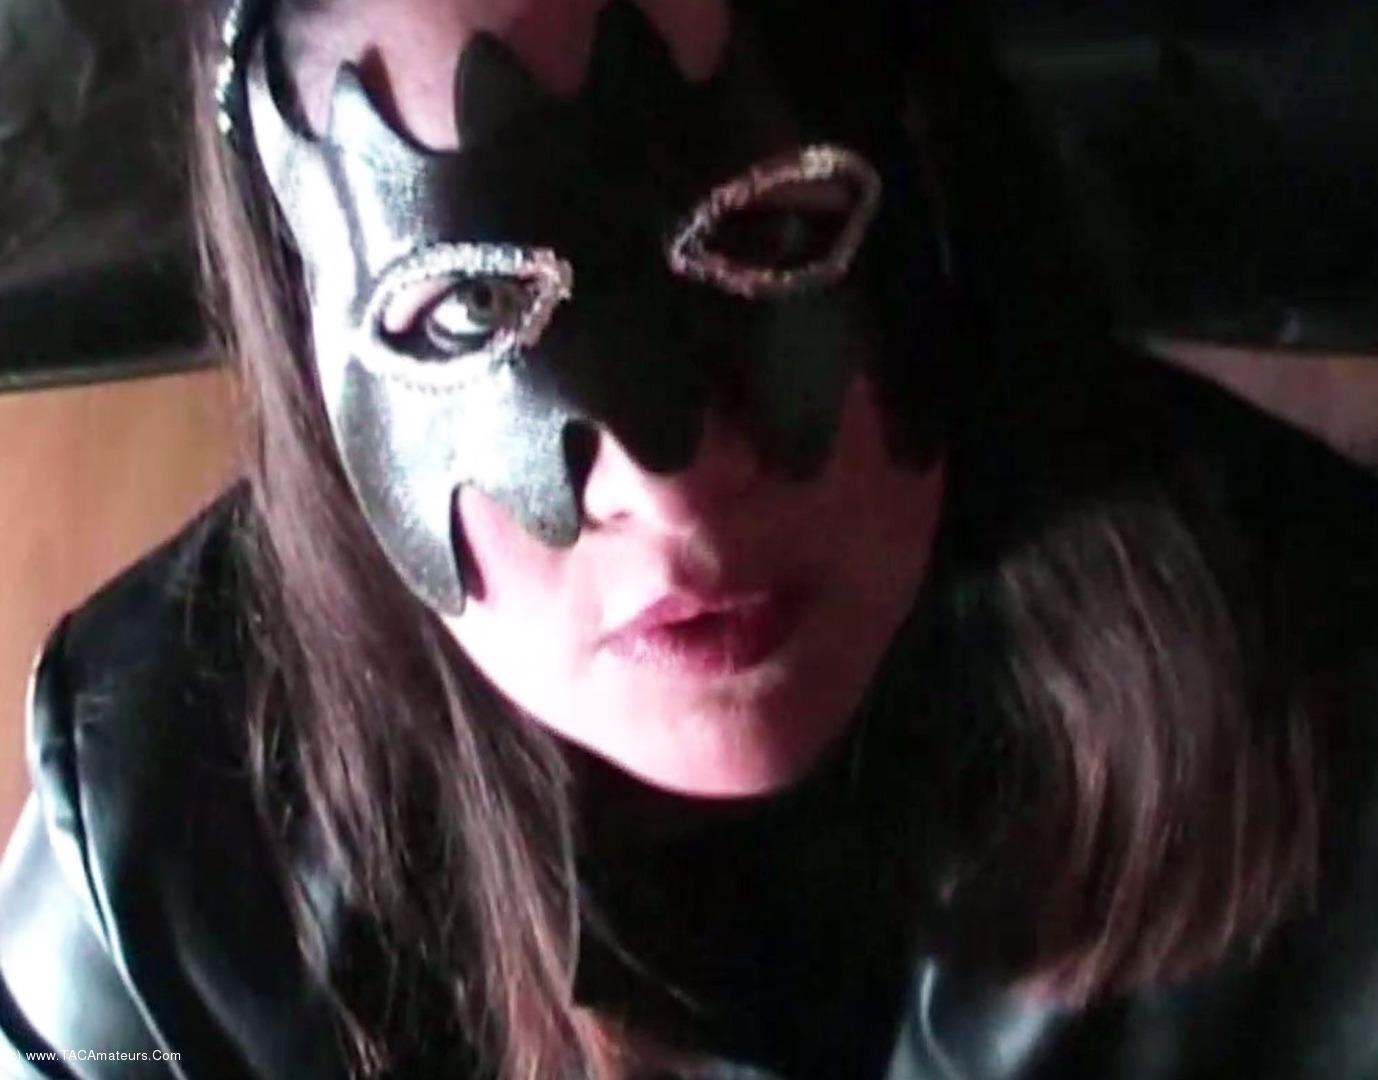 MrsLeather - Miss Kitty Wants Her Cream Pt1 scene 2